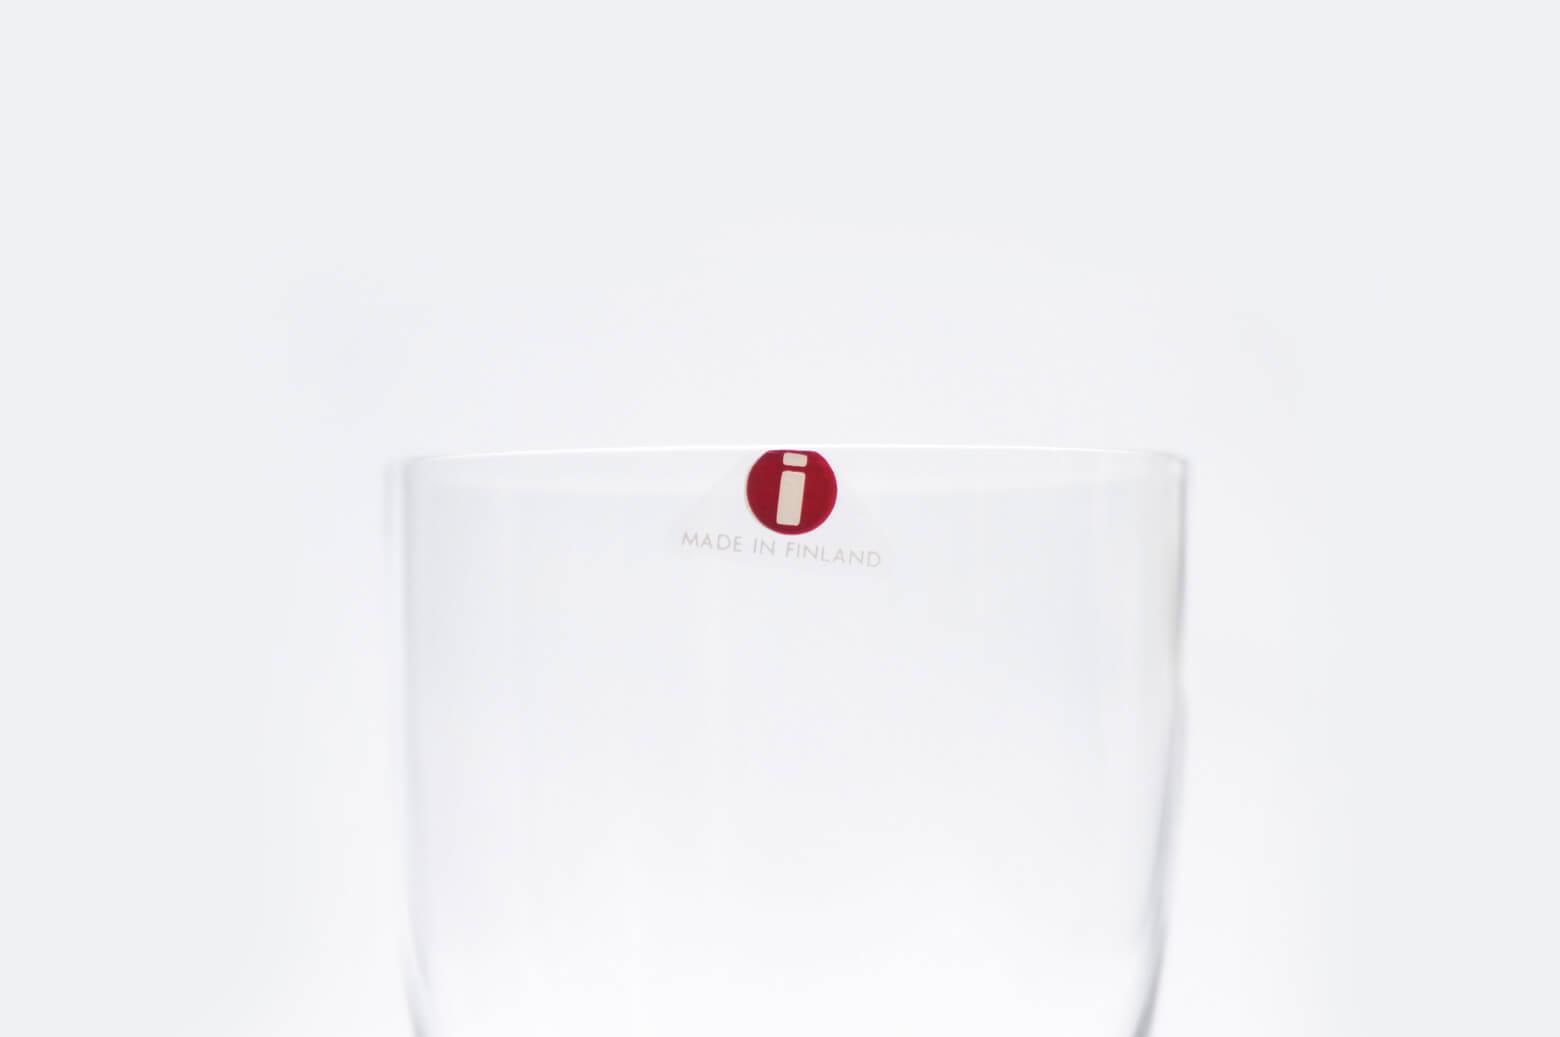 iittala Tapio Wirkkala White Wine Glass /イッタラ タピオ・ヴィルカラ ホワイト ワイン グラス 180ml 北欧食器 フィンランド 5